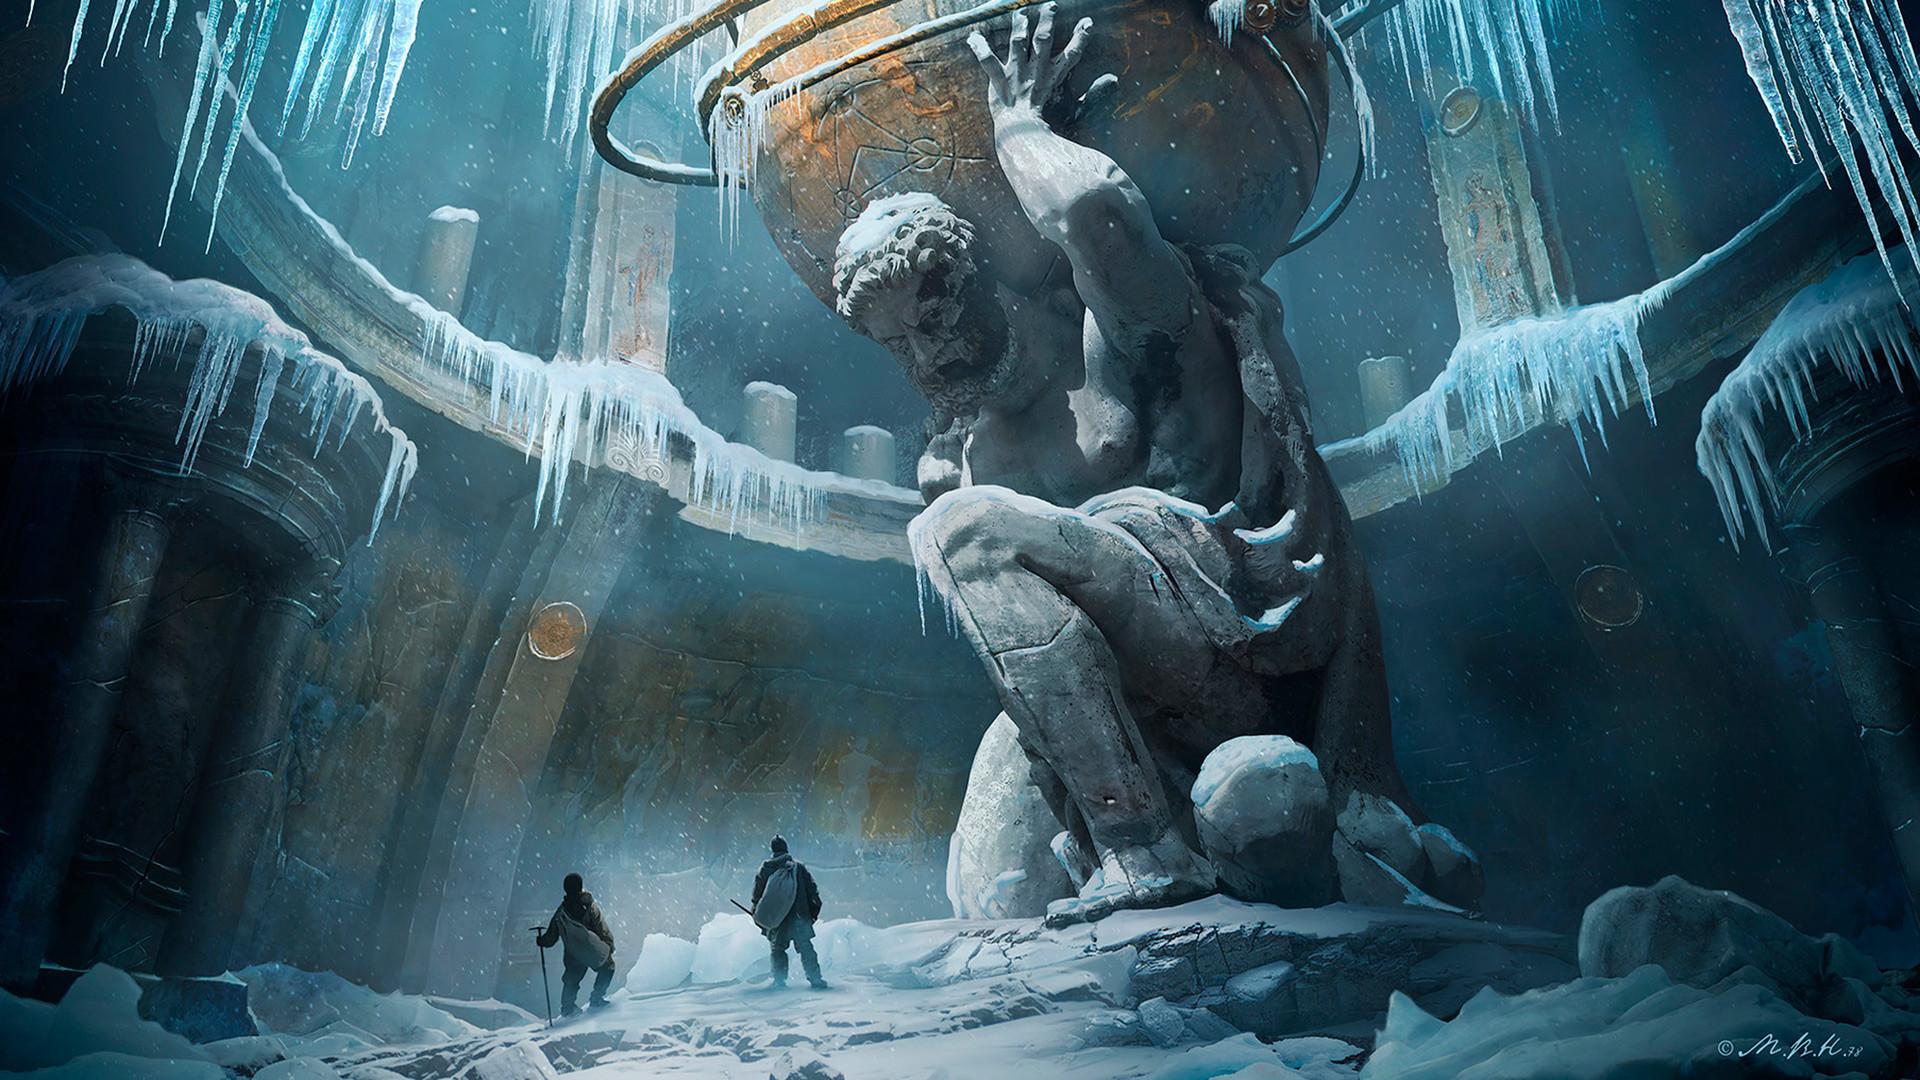 Post-apocalyptic art by Vladimir Manyukhin.